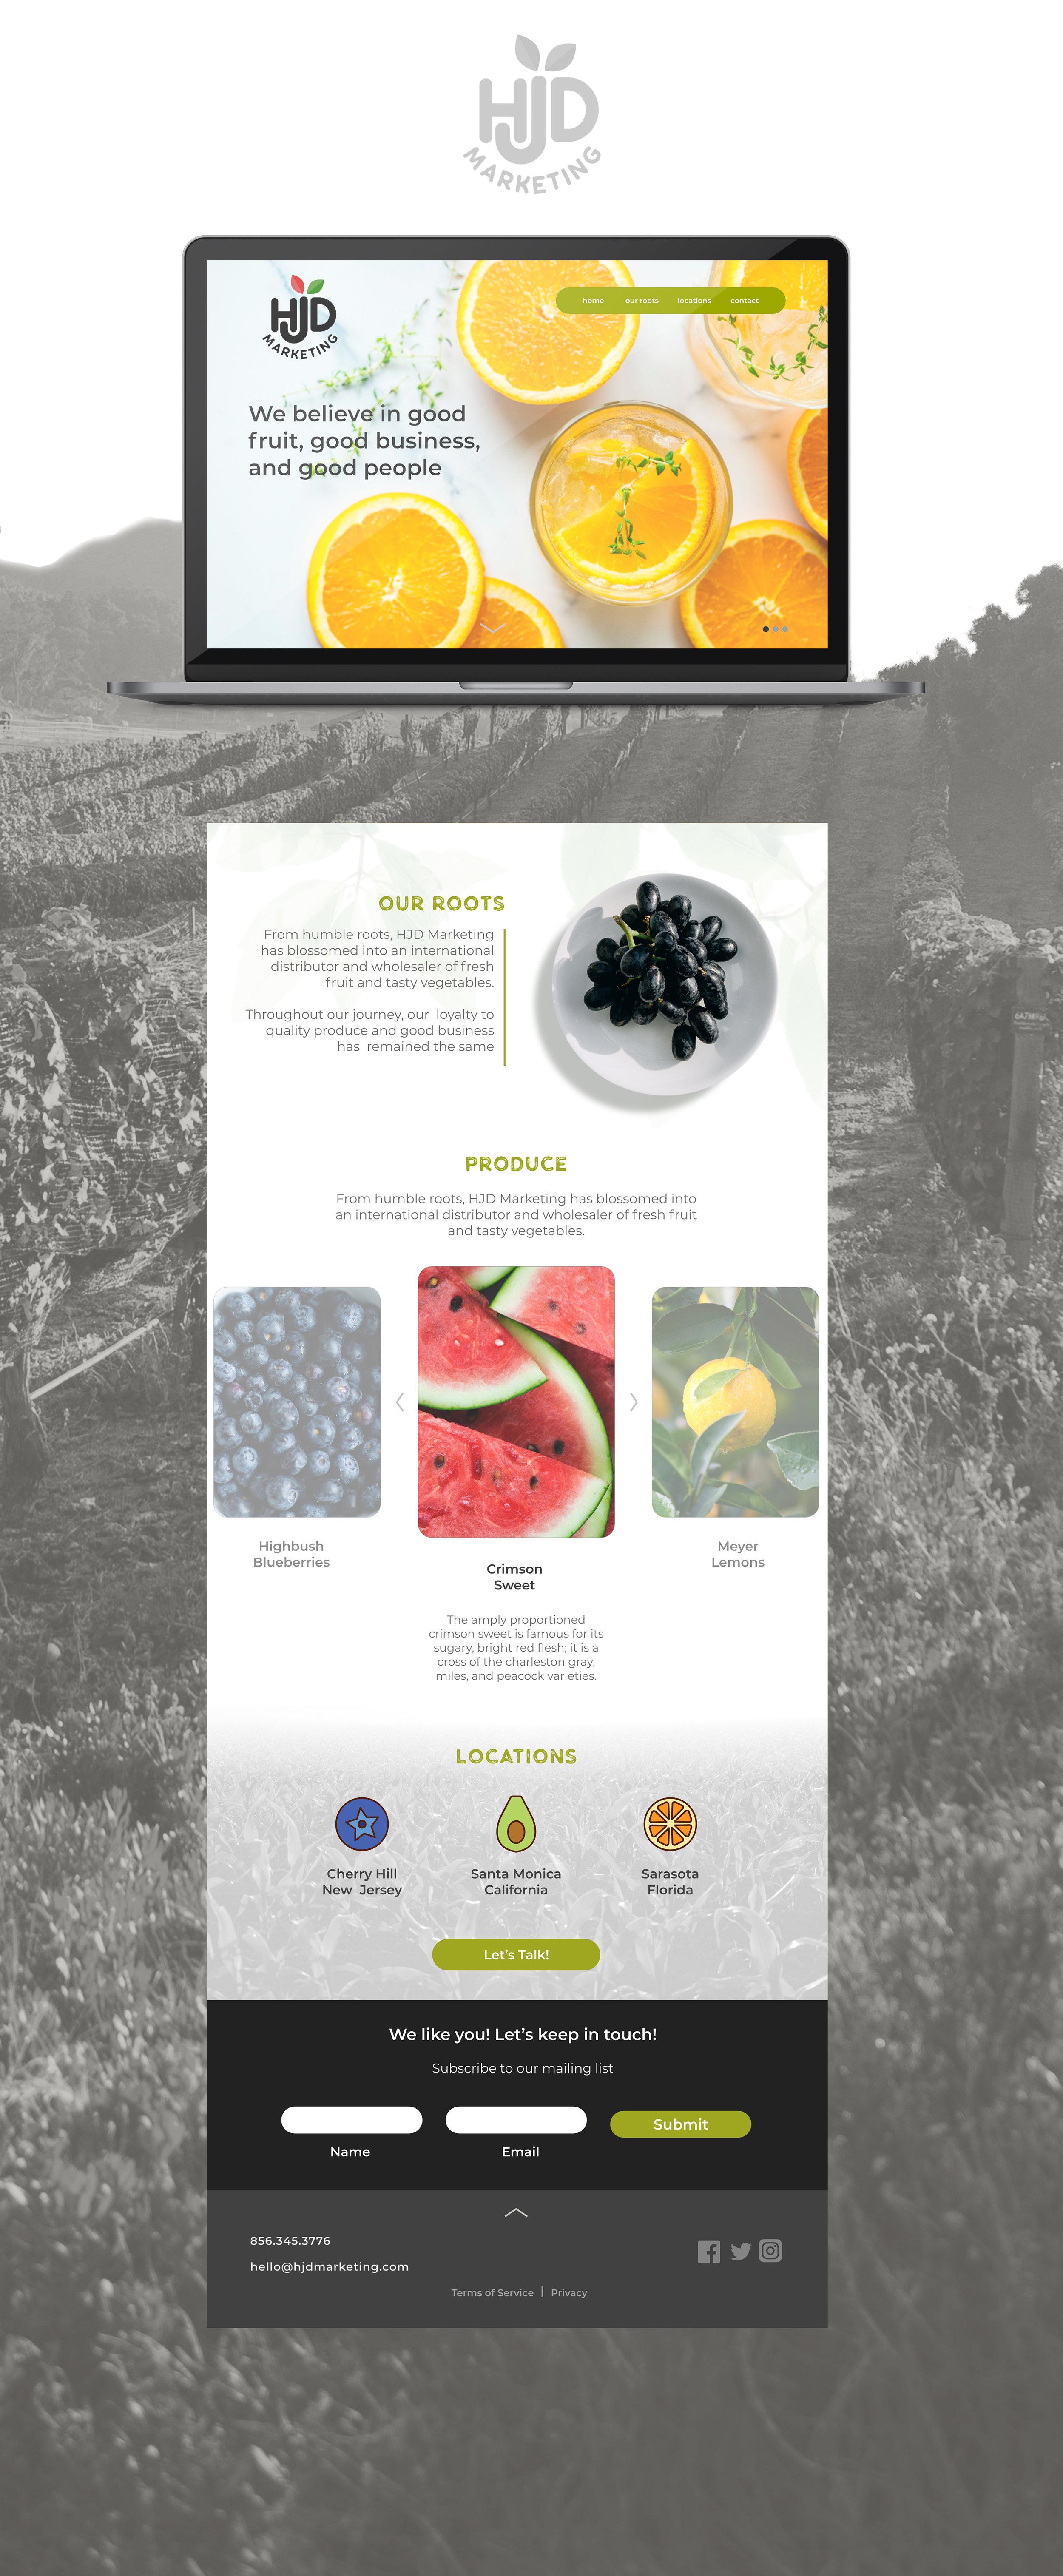 HJD Trees Website.jpg